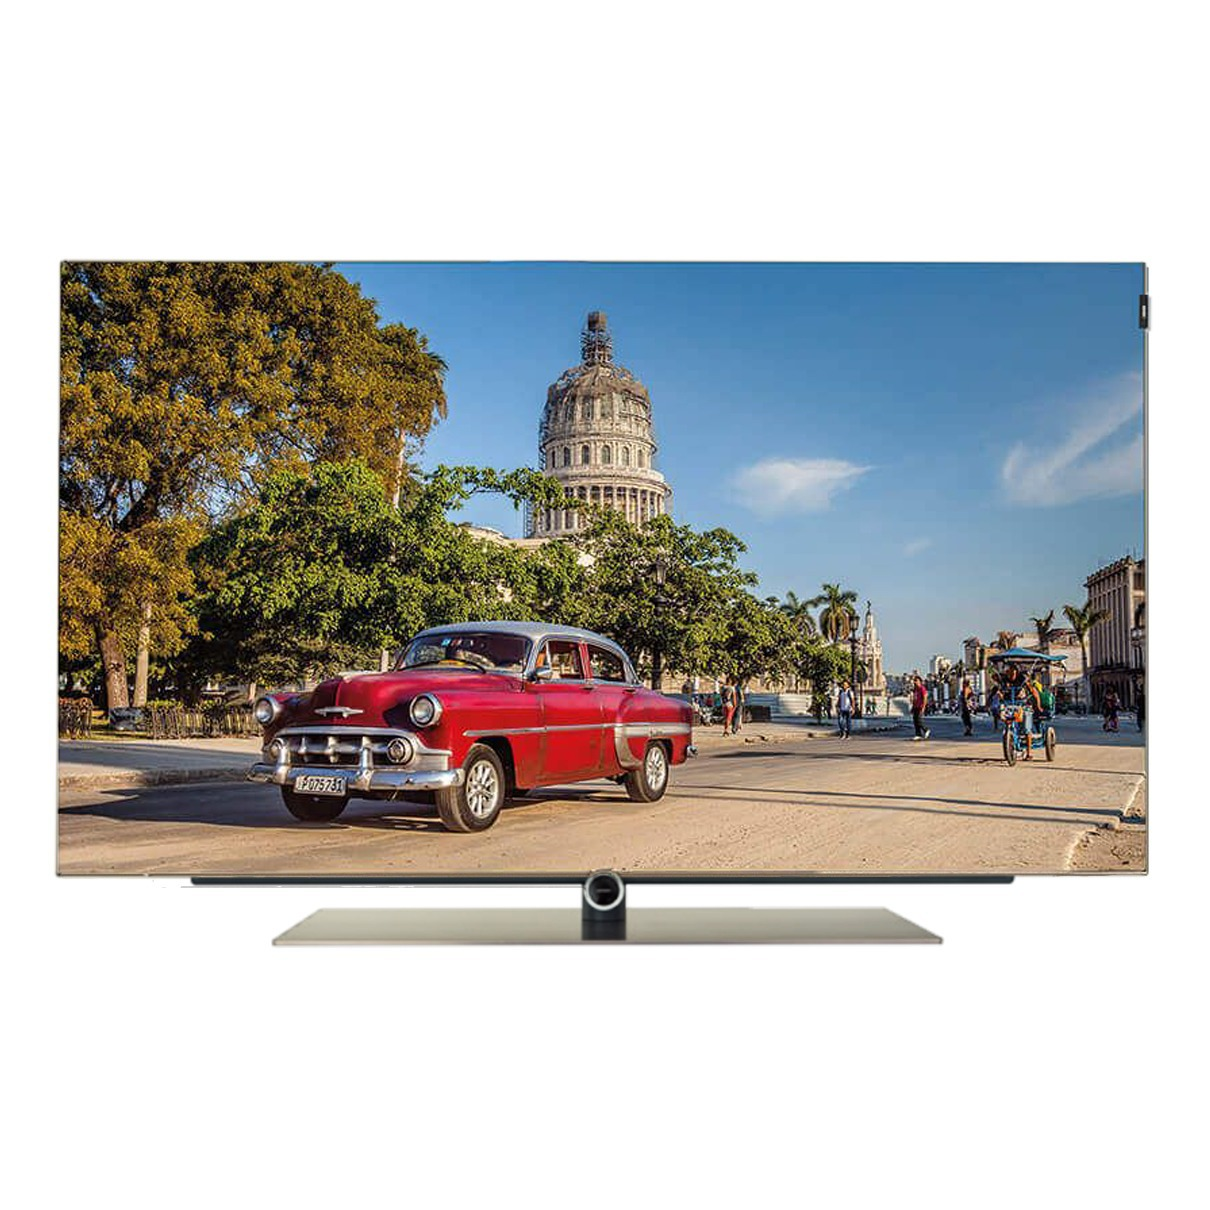 Loewe Bild 5.55 OLED 55 inch OLED TV